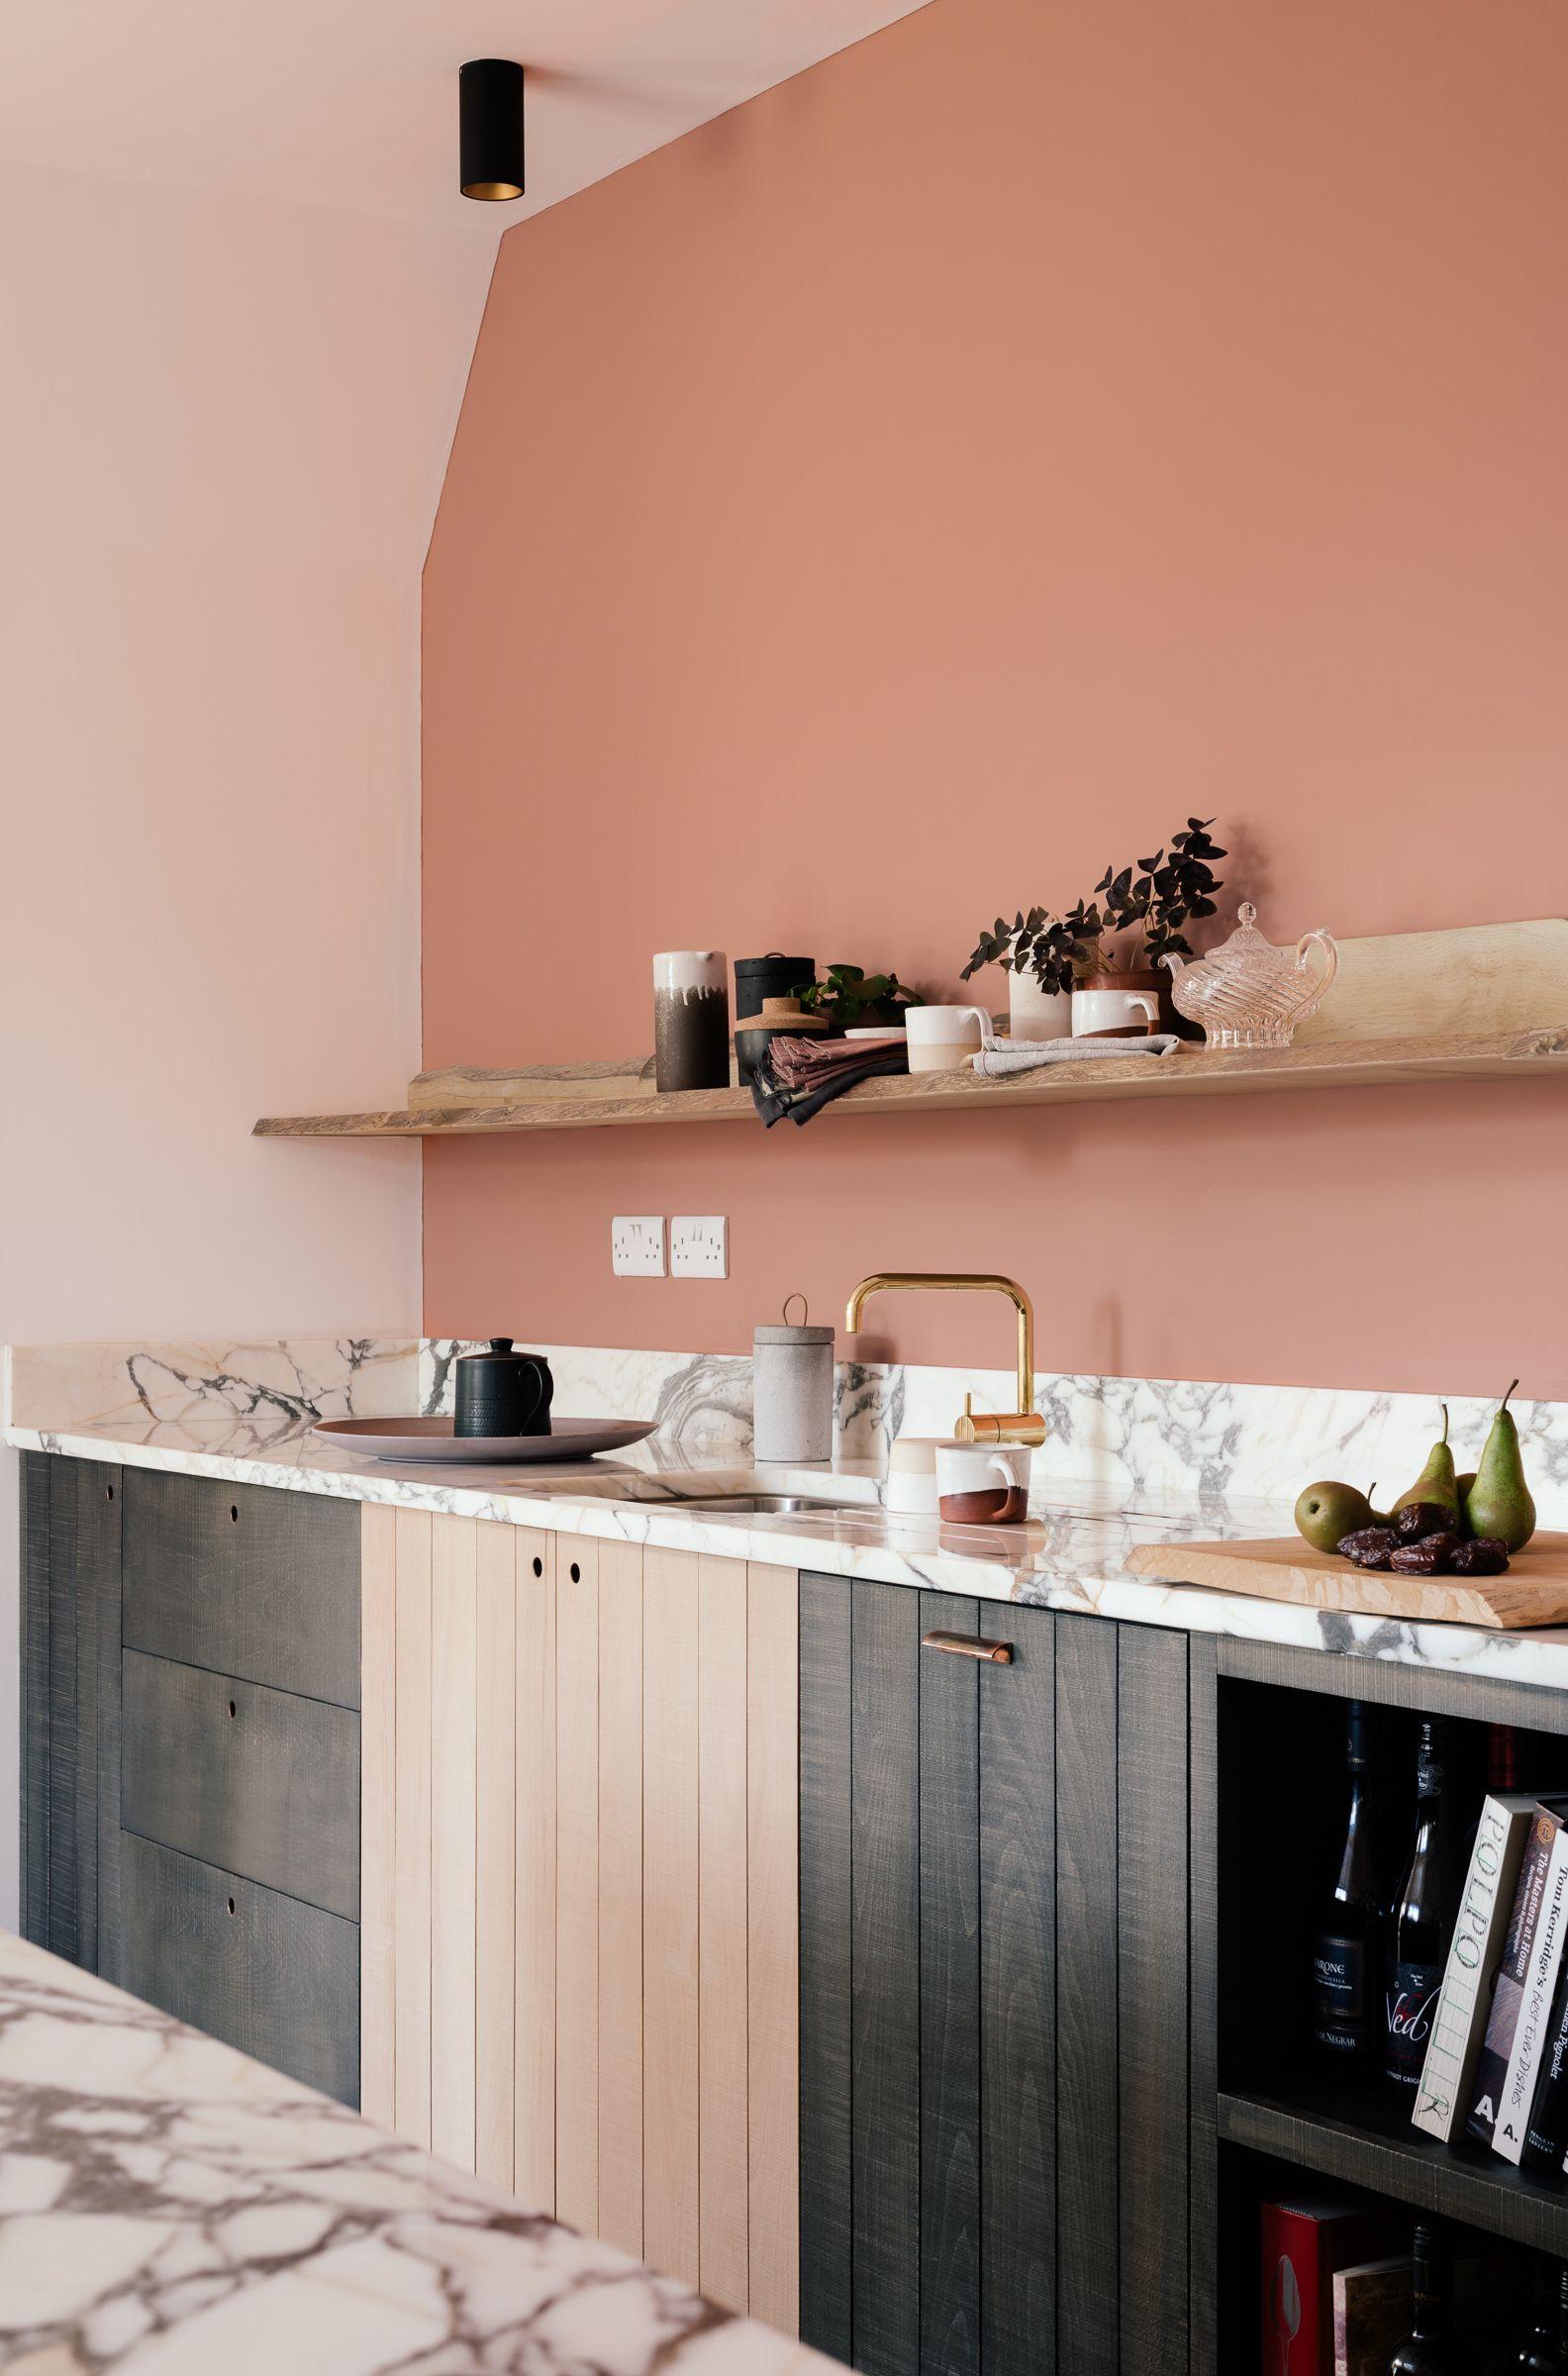 40++ Cuisine blanche mur terracotta ideas in 2021